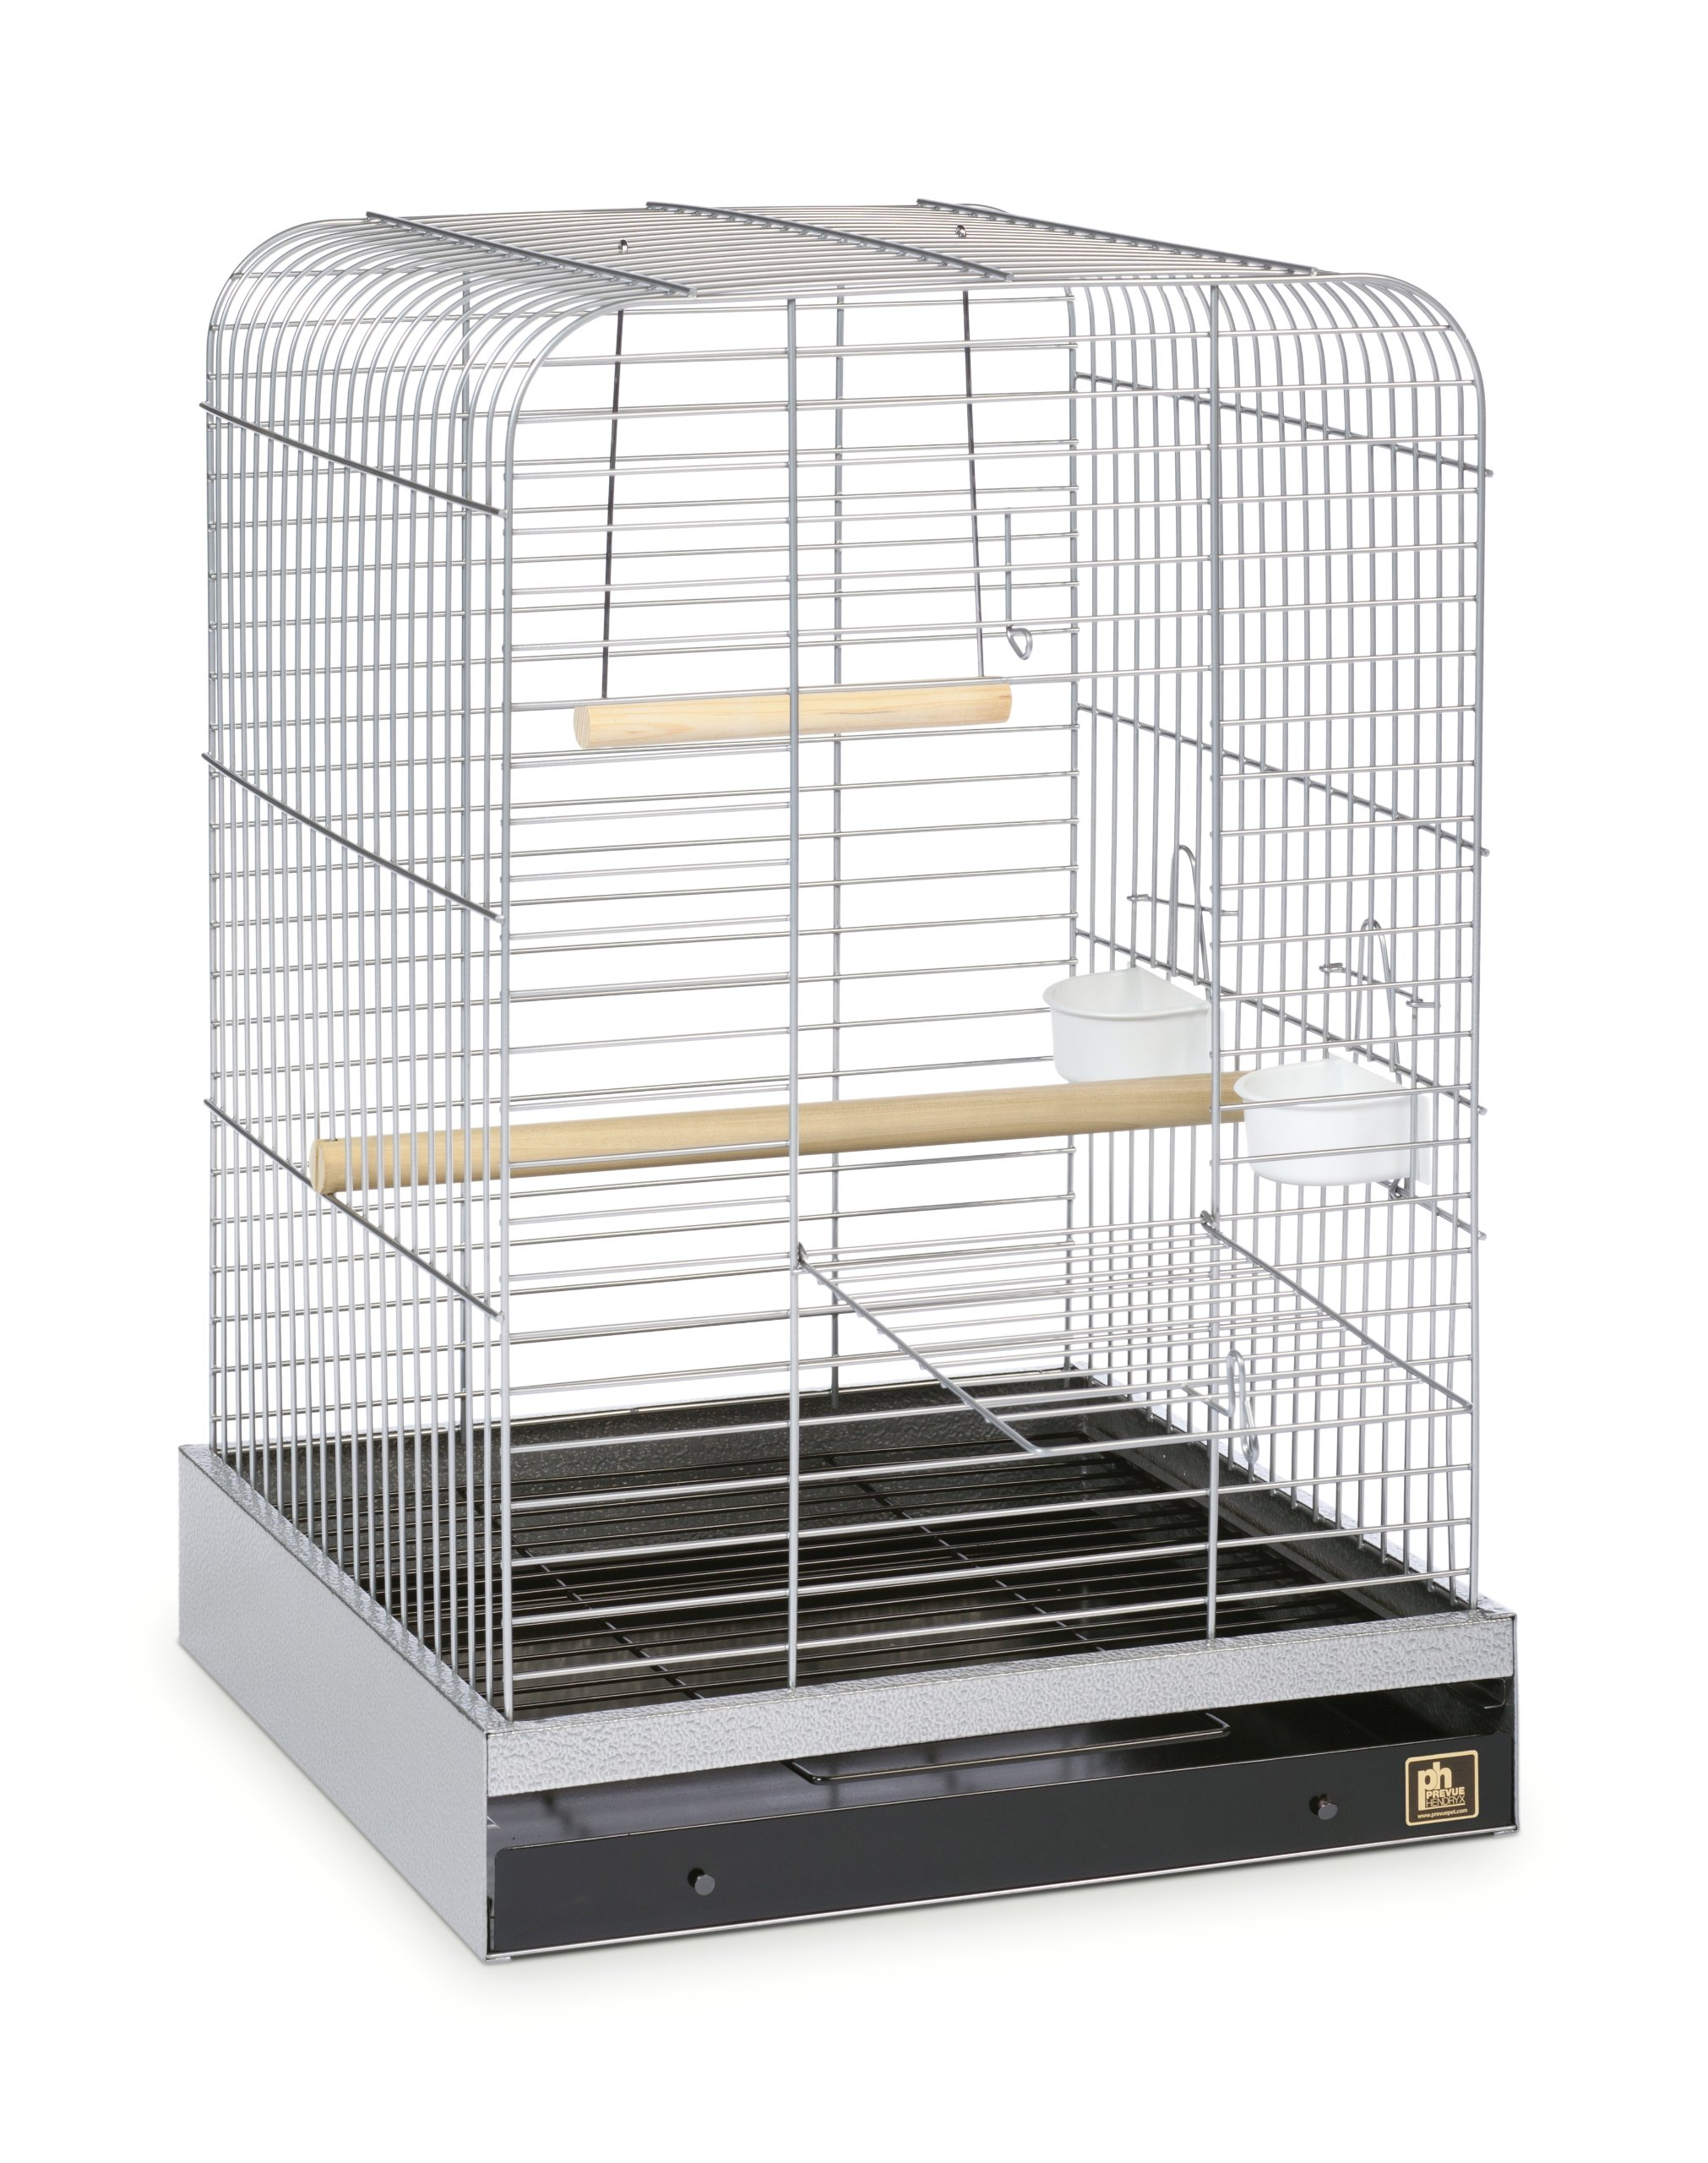 Prevue Pet Products 125C Parrot Cage, Chrome by Prevue Pet Products